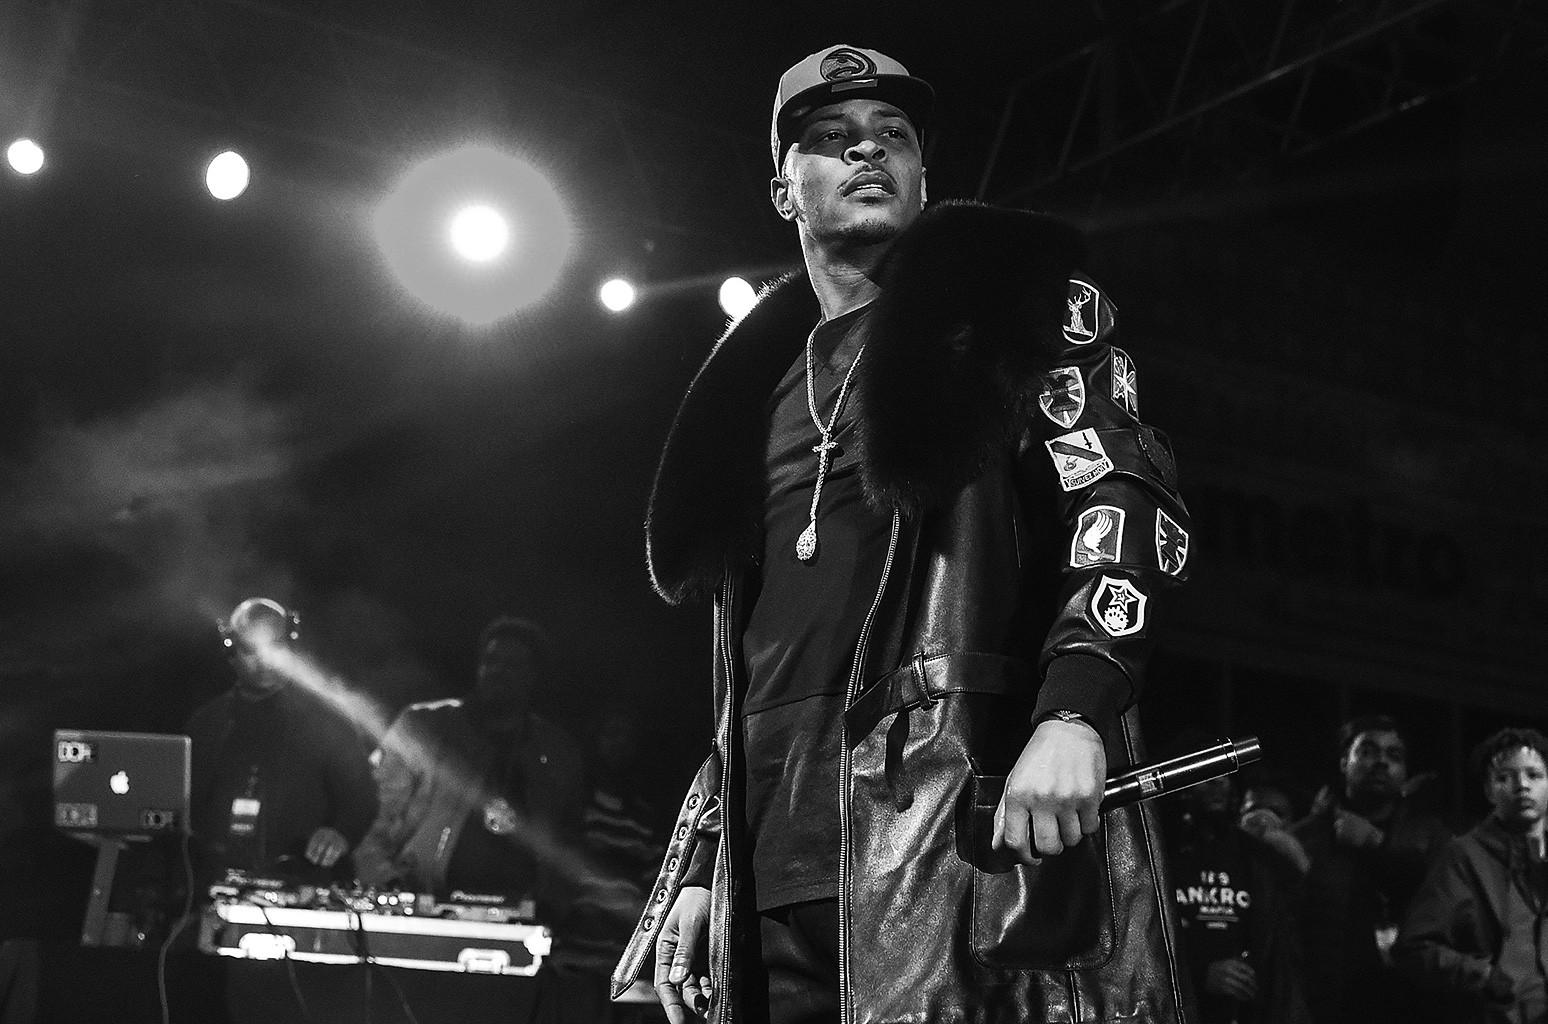 T.I. performs onstage at Peach Drop 2016 at Underground Atlanta on Dec. 31, 2015 in Atlanta.